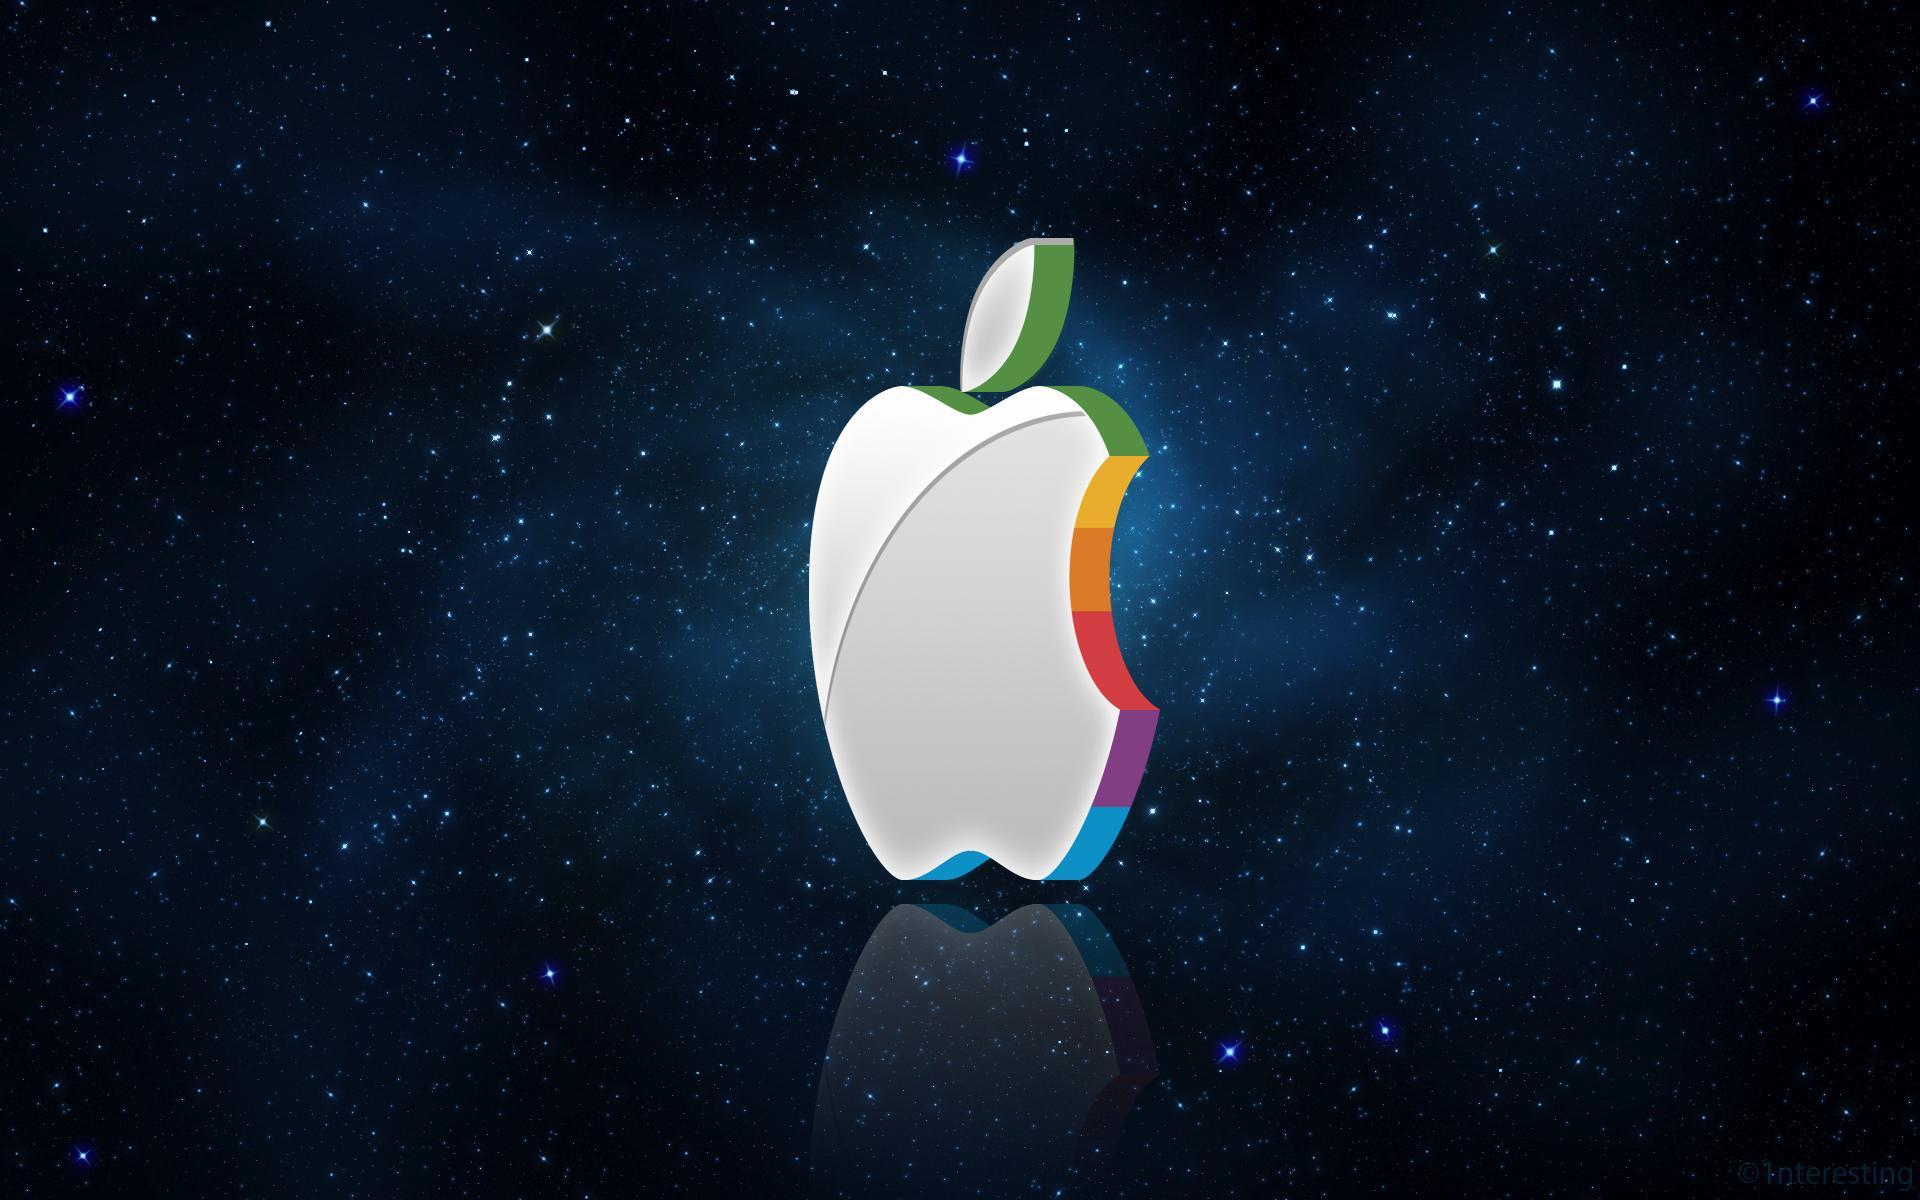 Apple 3D Wallpapers